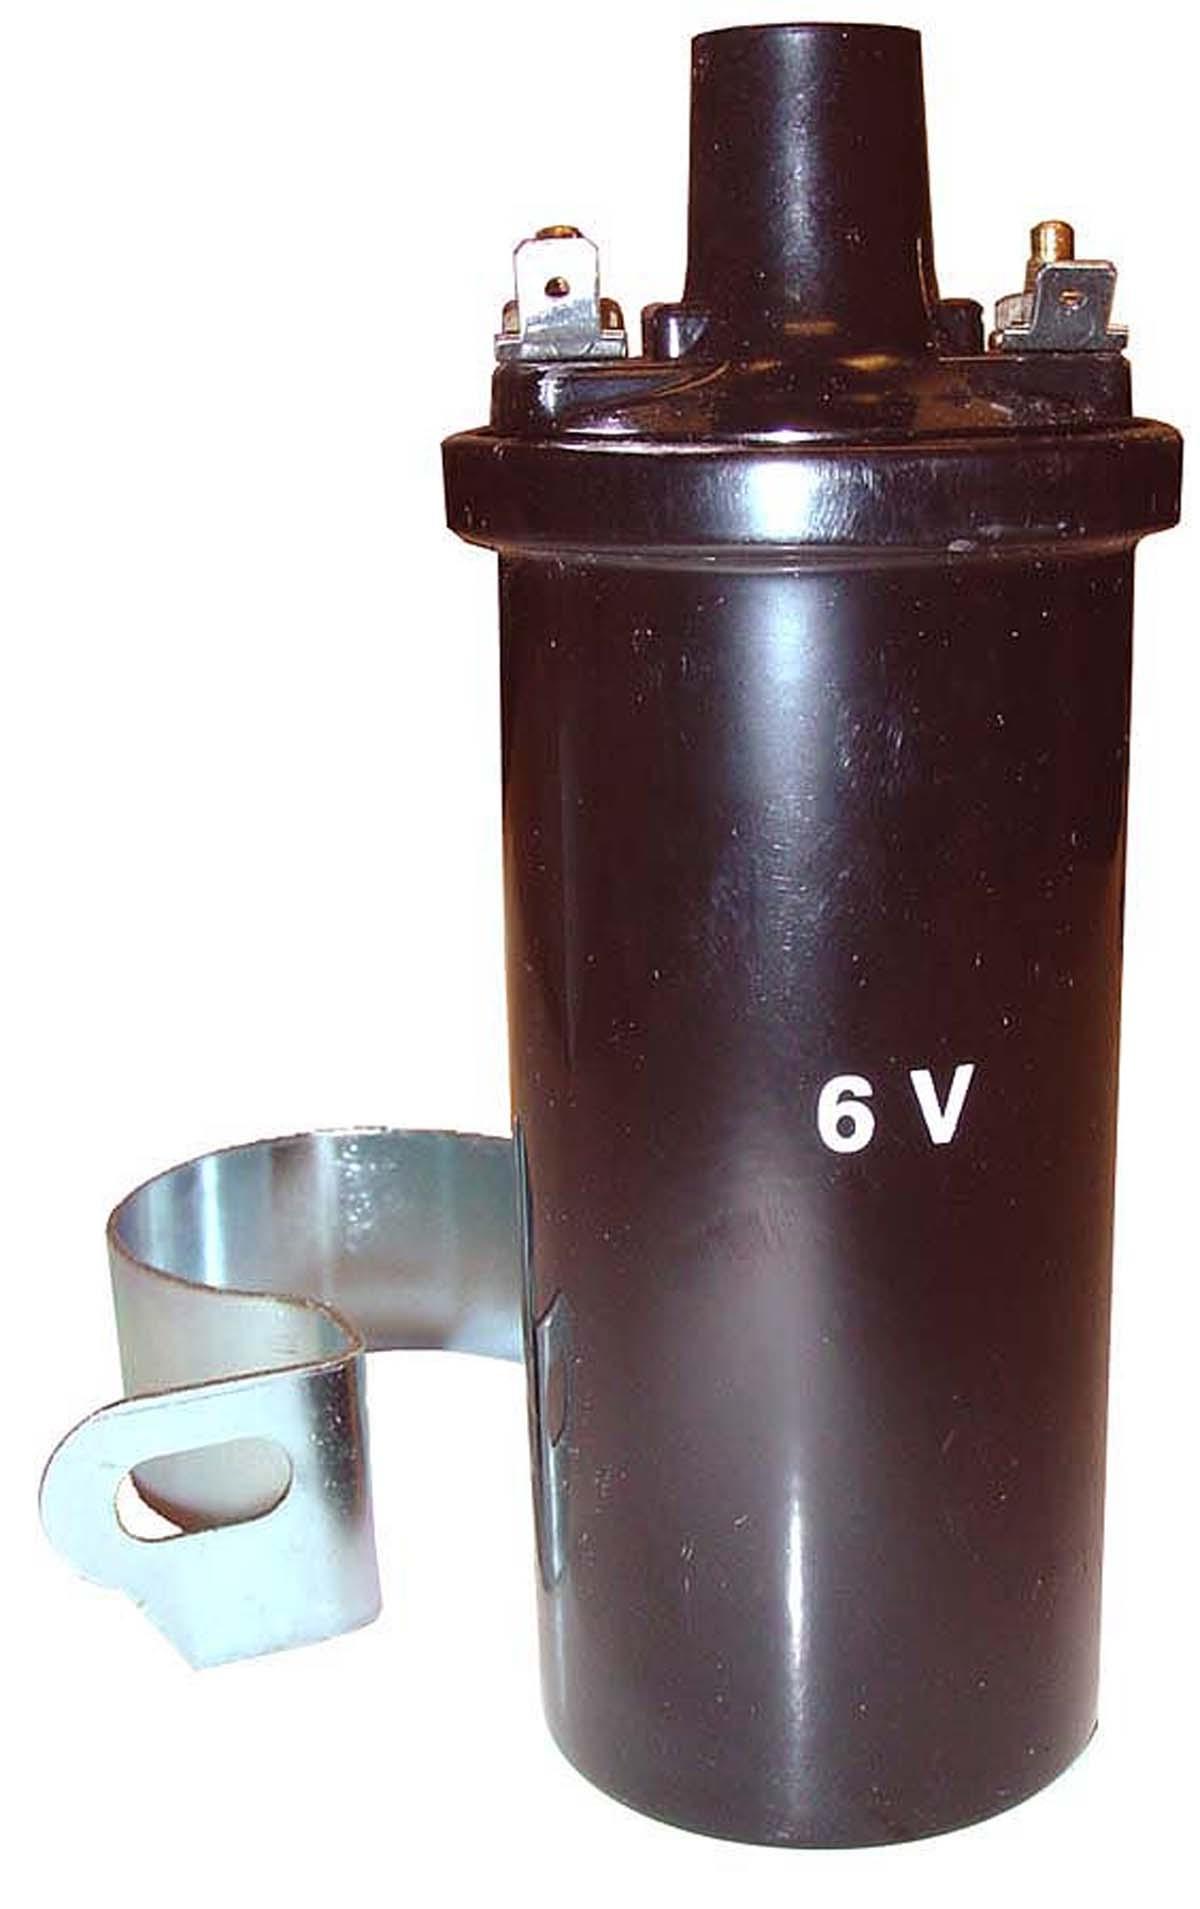 6 VOLT Ignition Coil